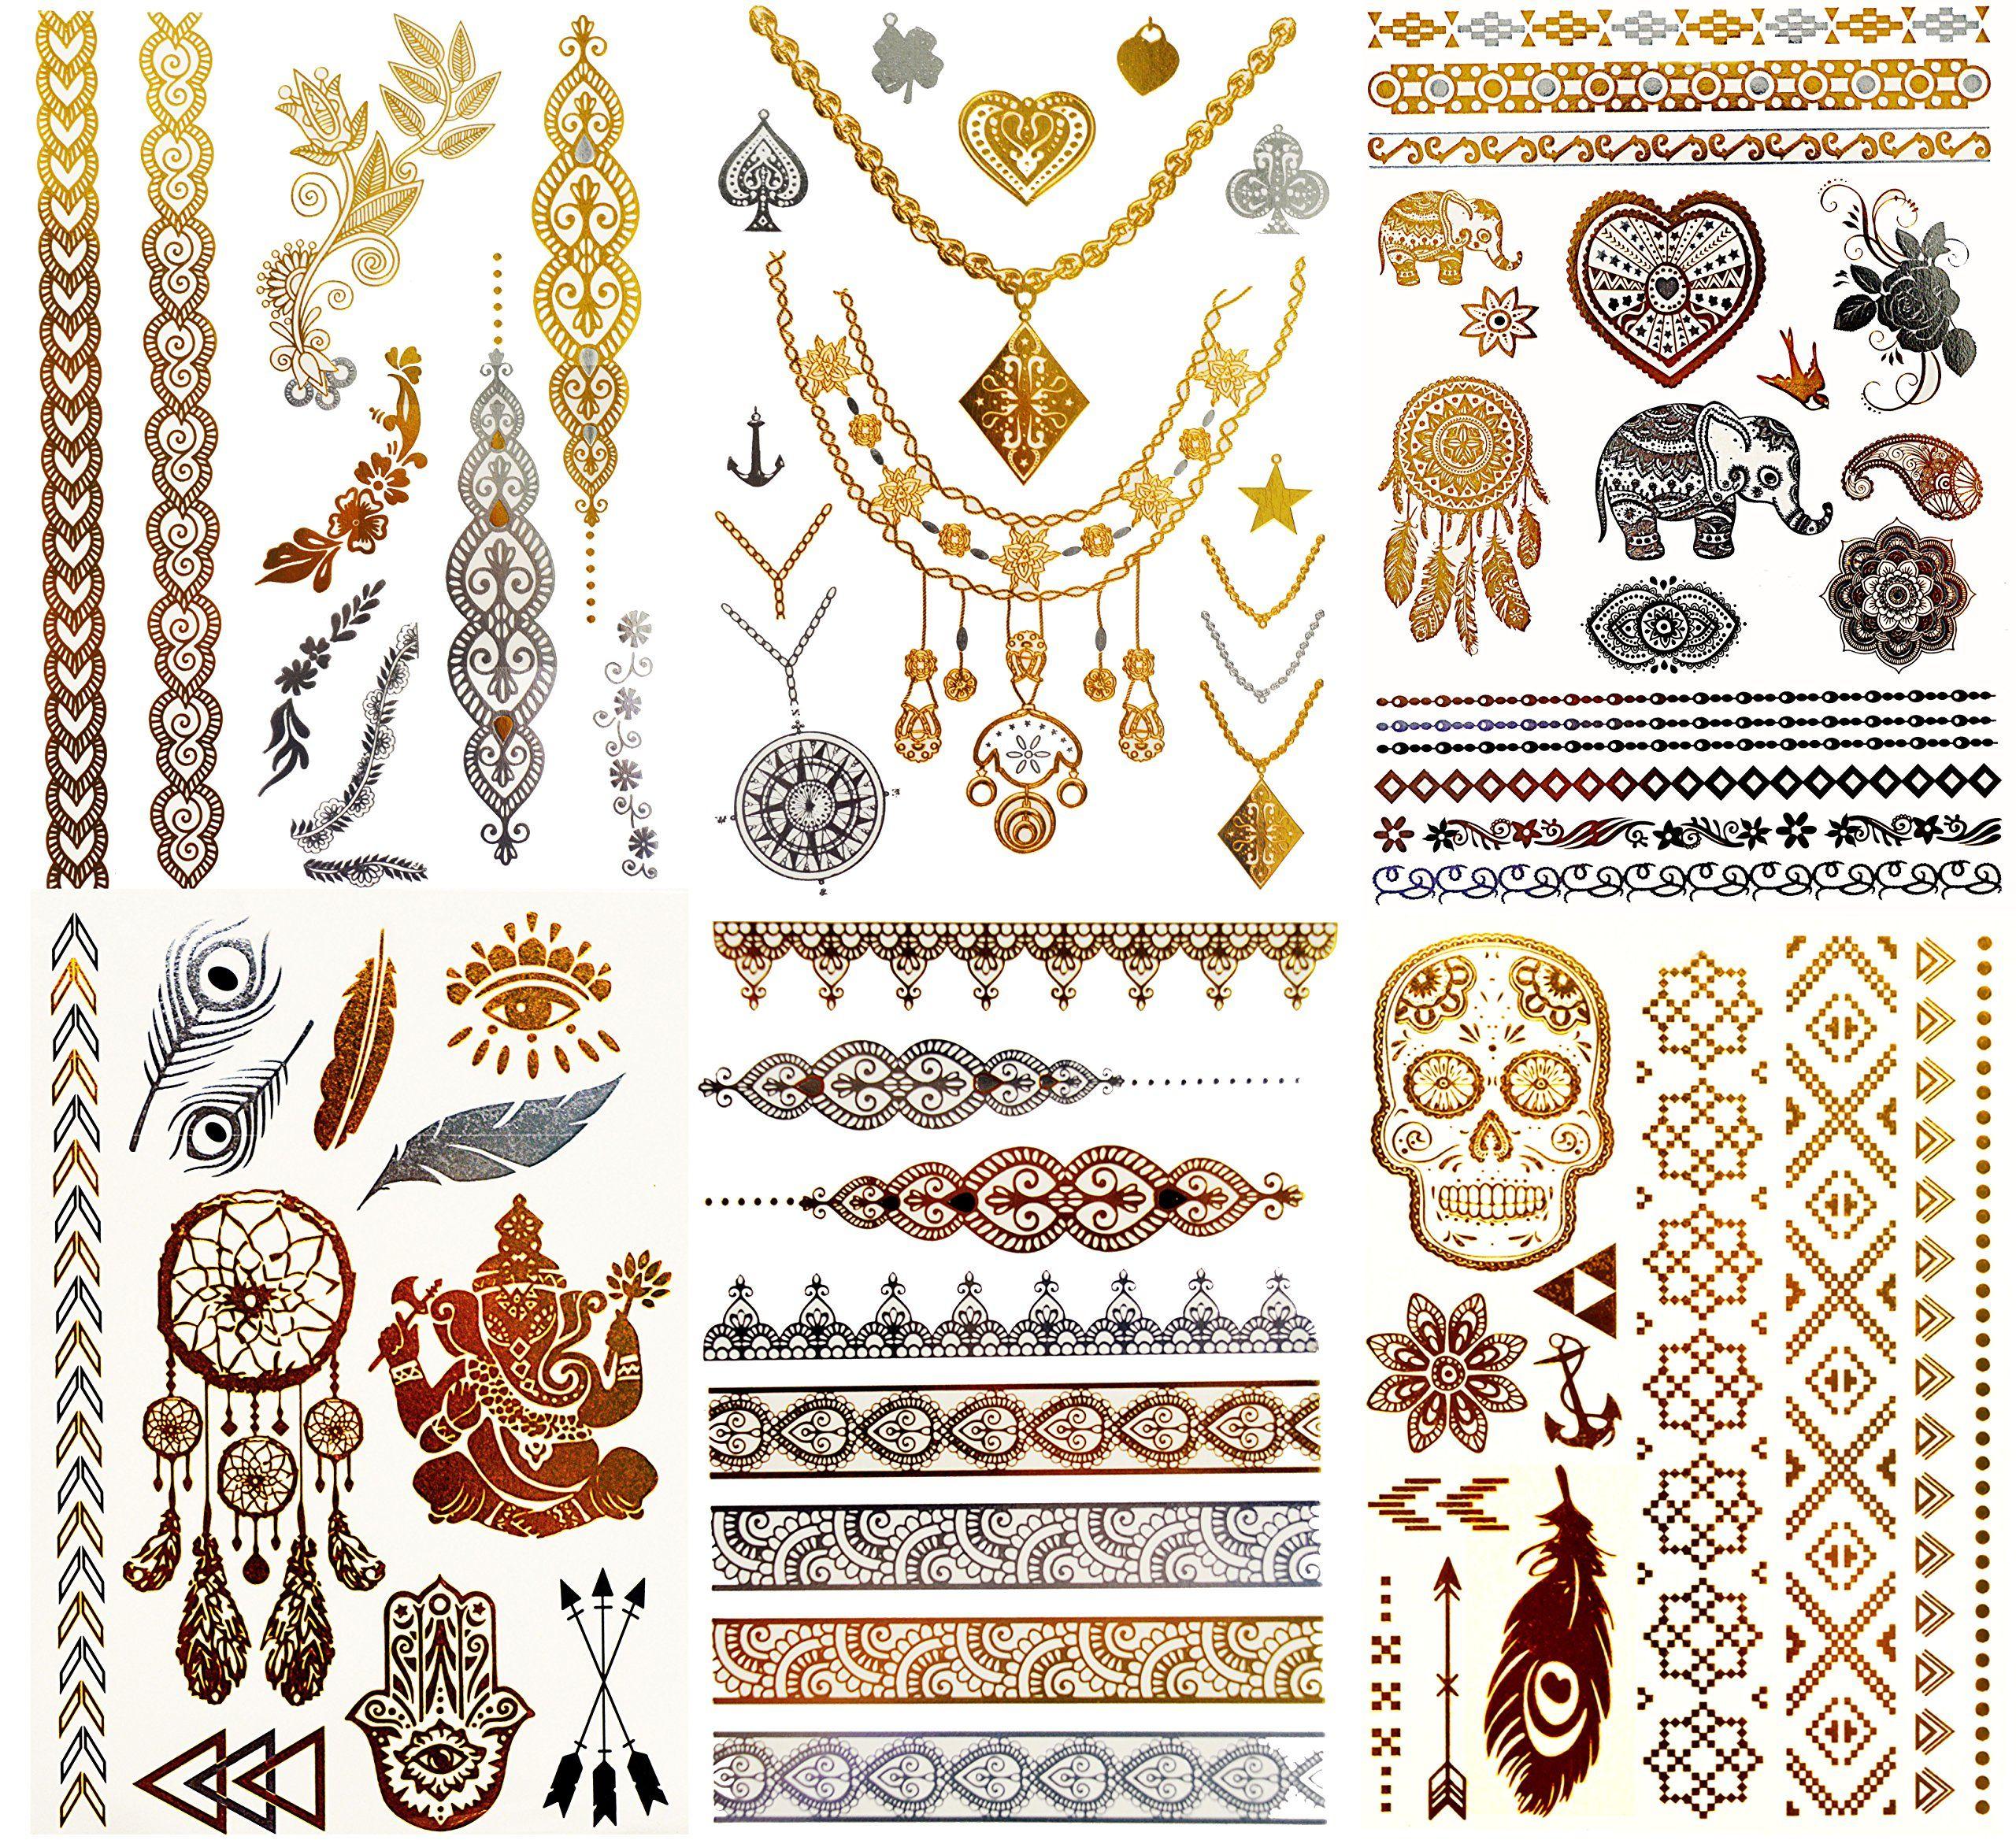 Dk Premium Metallic Temporary Tattoos Waterproof Tattoo Stickers For Women Teens Girls Temporary Fak Shimmer Jewelry Metallic Tattoo Temporary Jewelry Tattoo